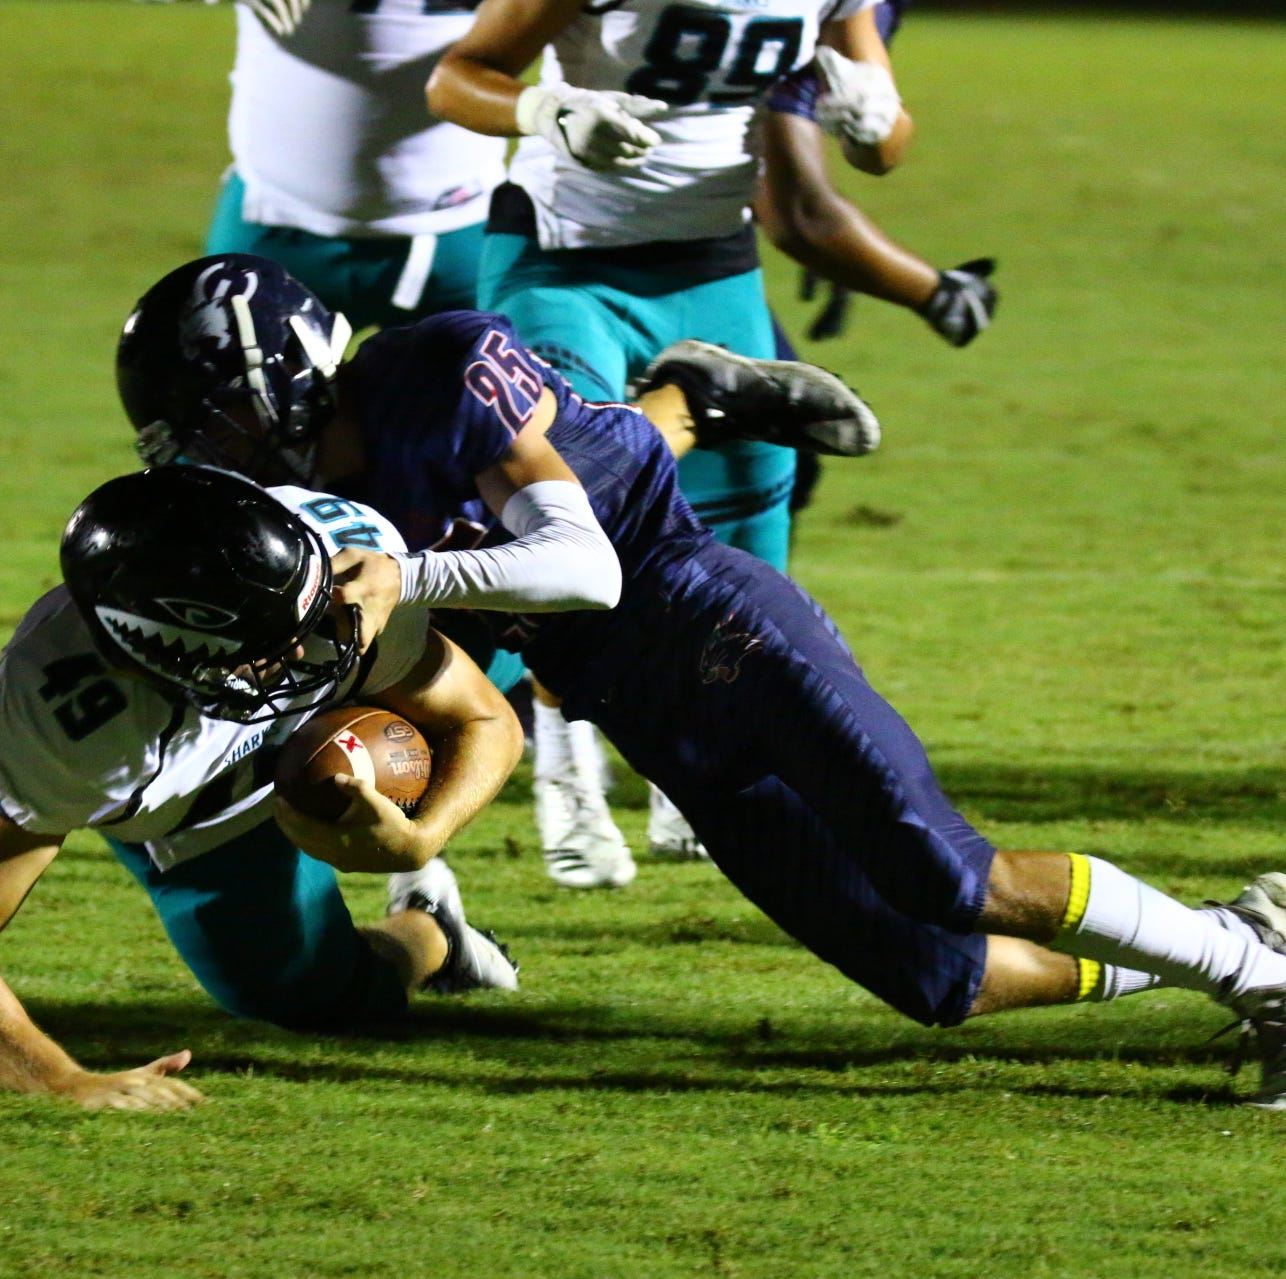 SWFL High School football: Scores, photos, videos from Week 5 of the regular season